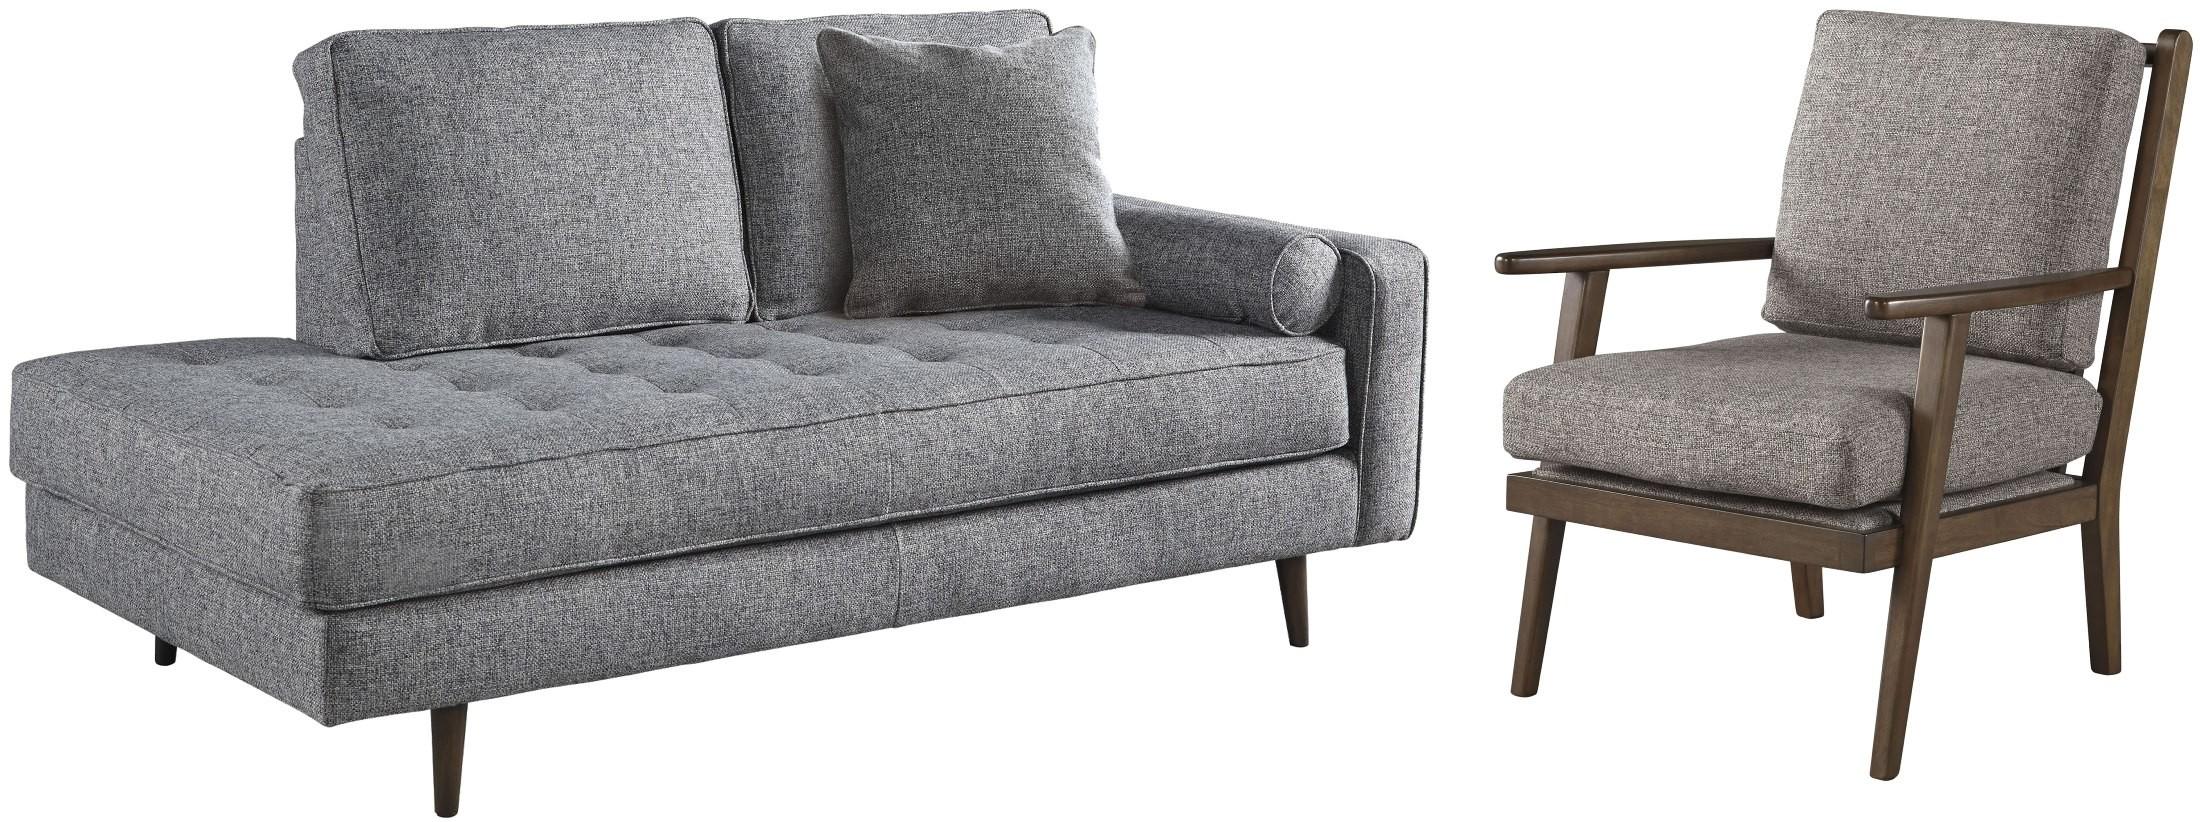 Zardoni Charcoal Living Room Set From Ashley Coleman Furniture